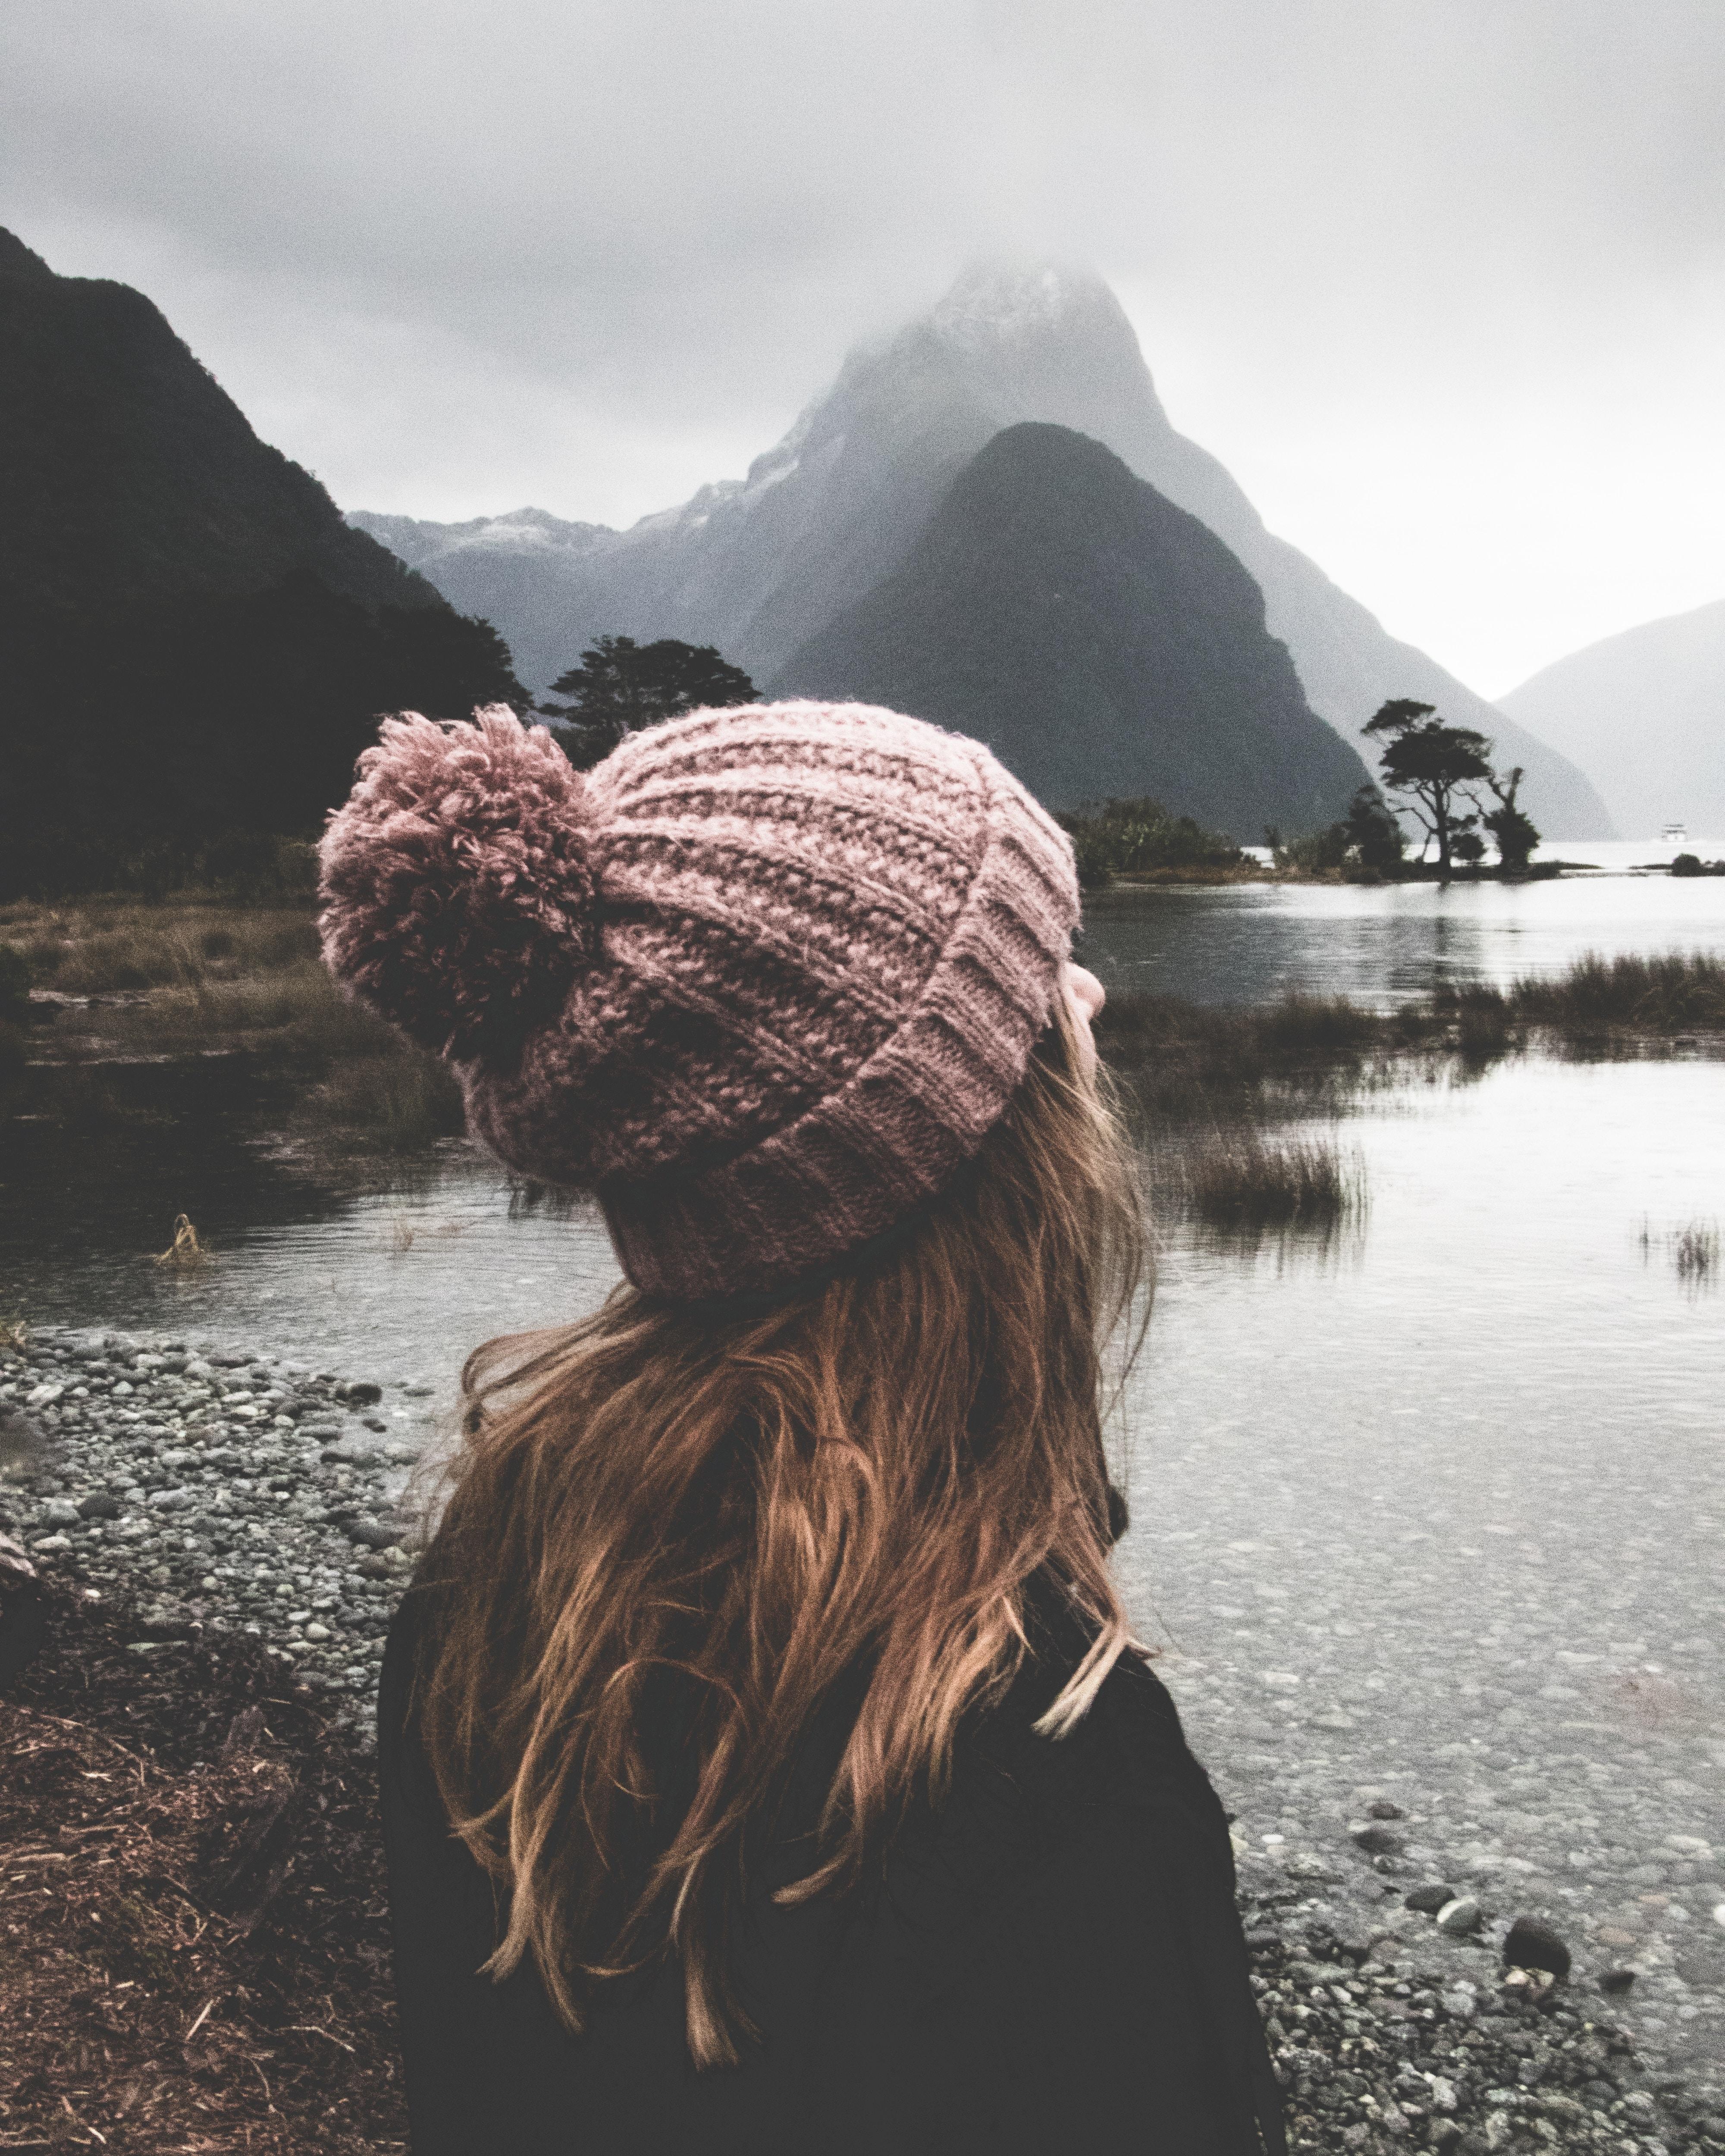 woman watching body of water during daytime